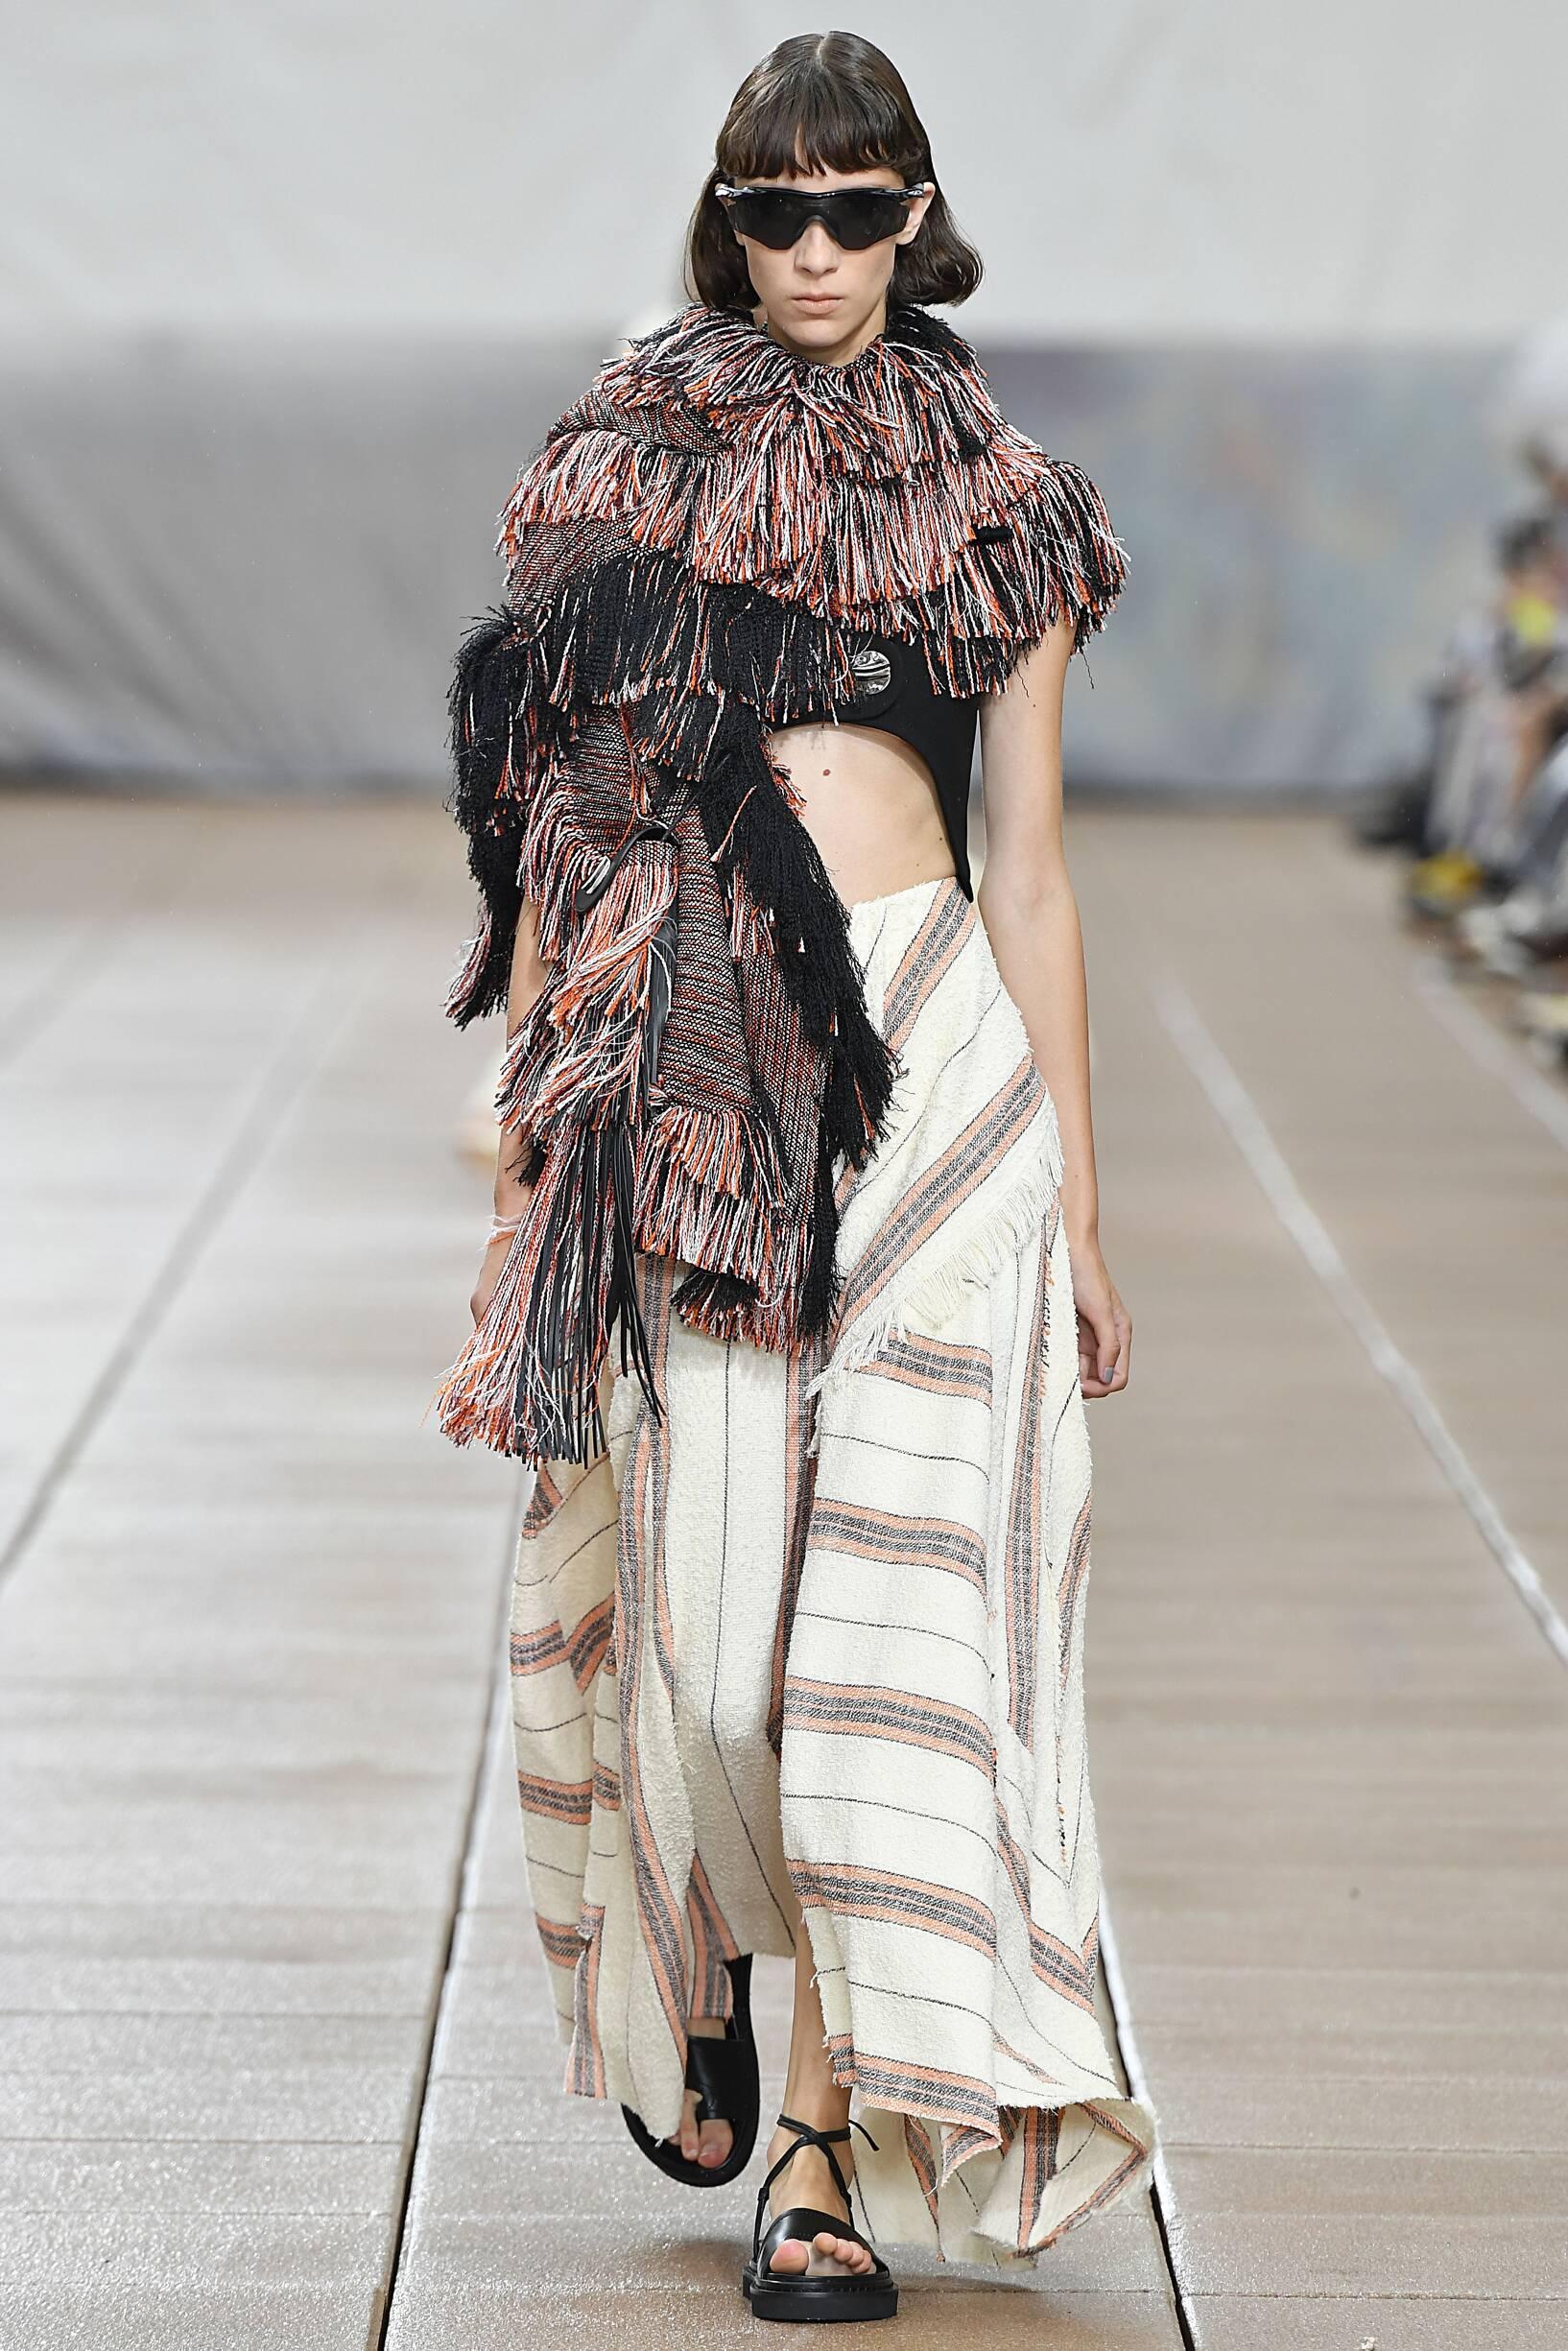 SS 2019 3.1 Phillip Lim Fashion Show